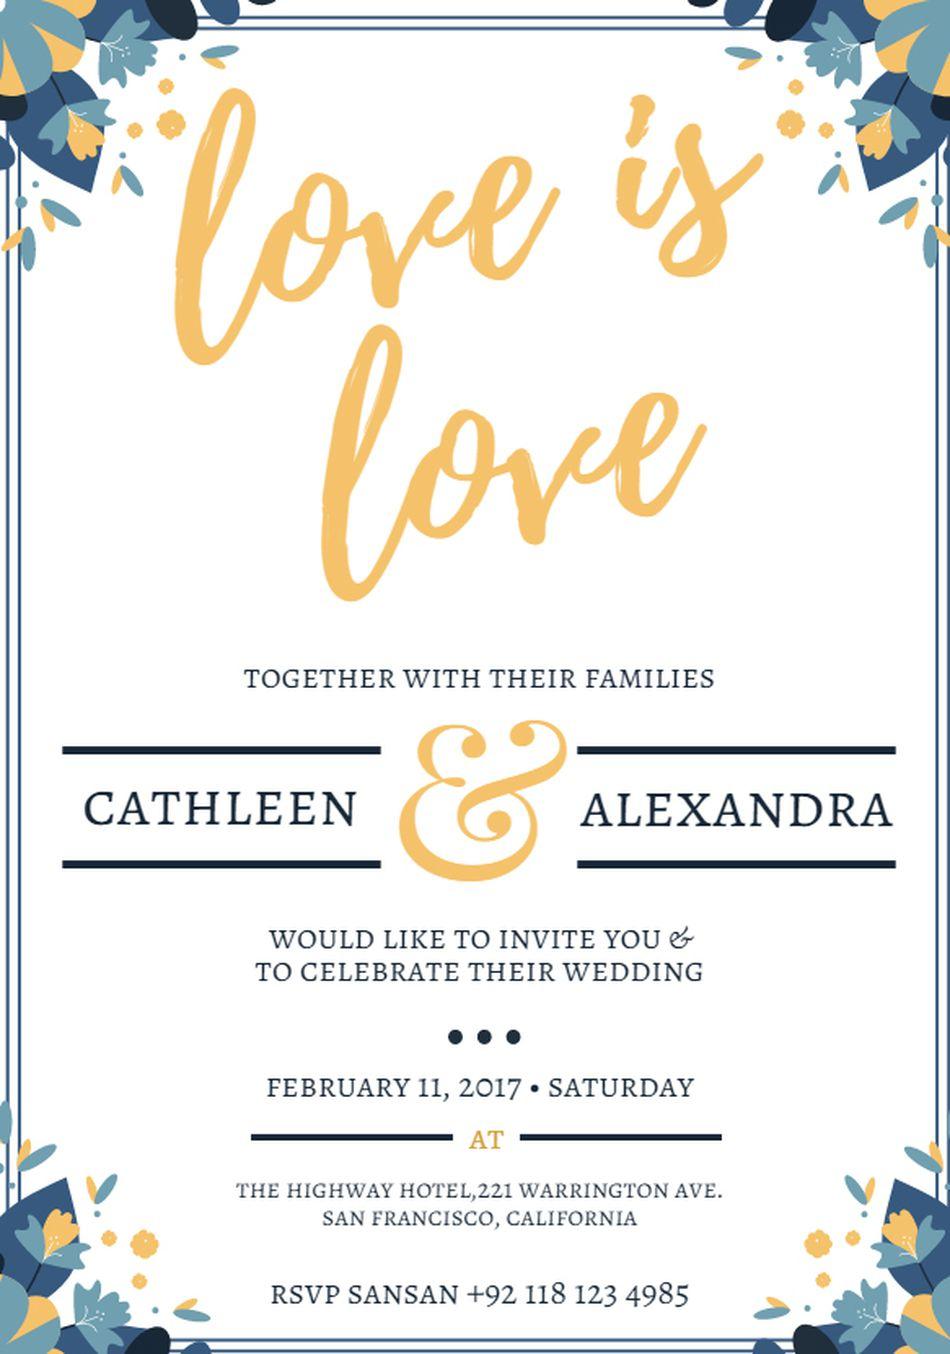 wedding card templates free printable 21gowedding com